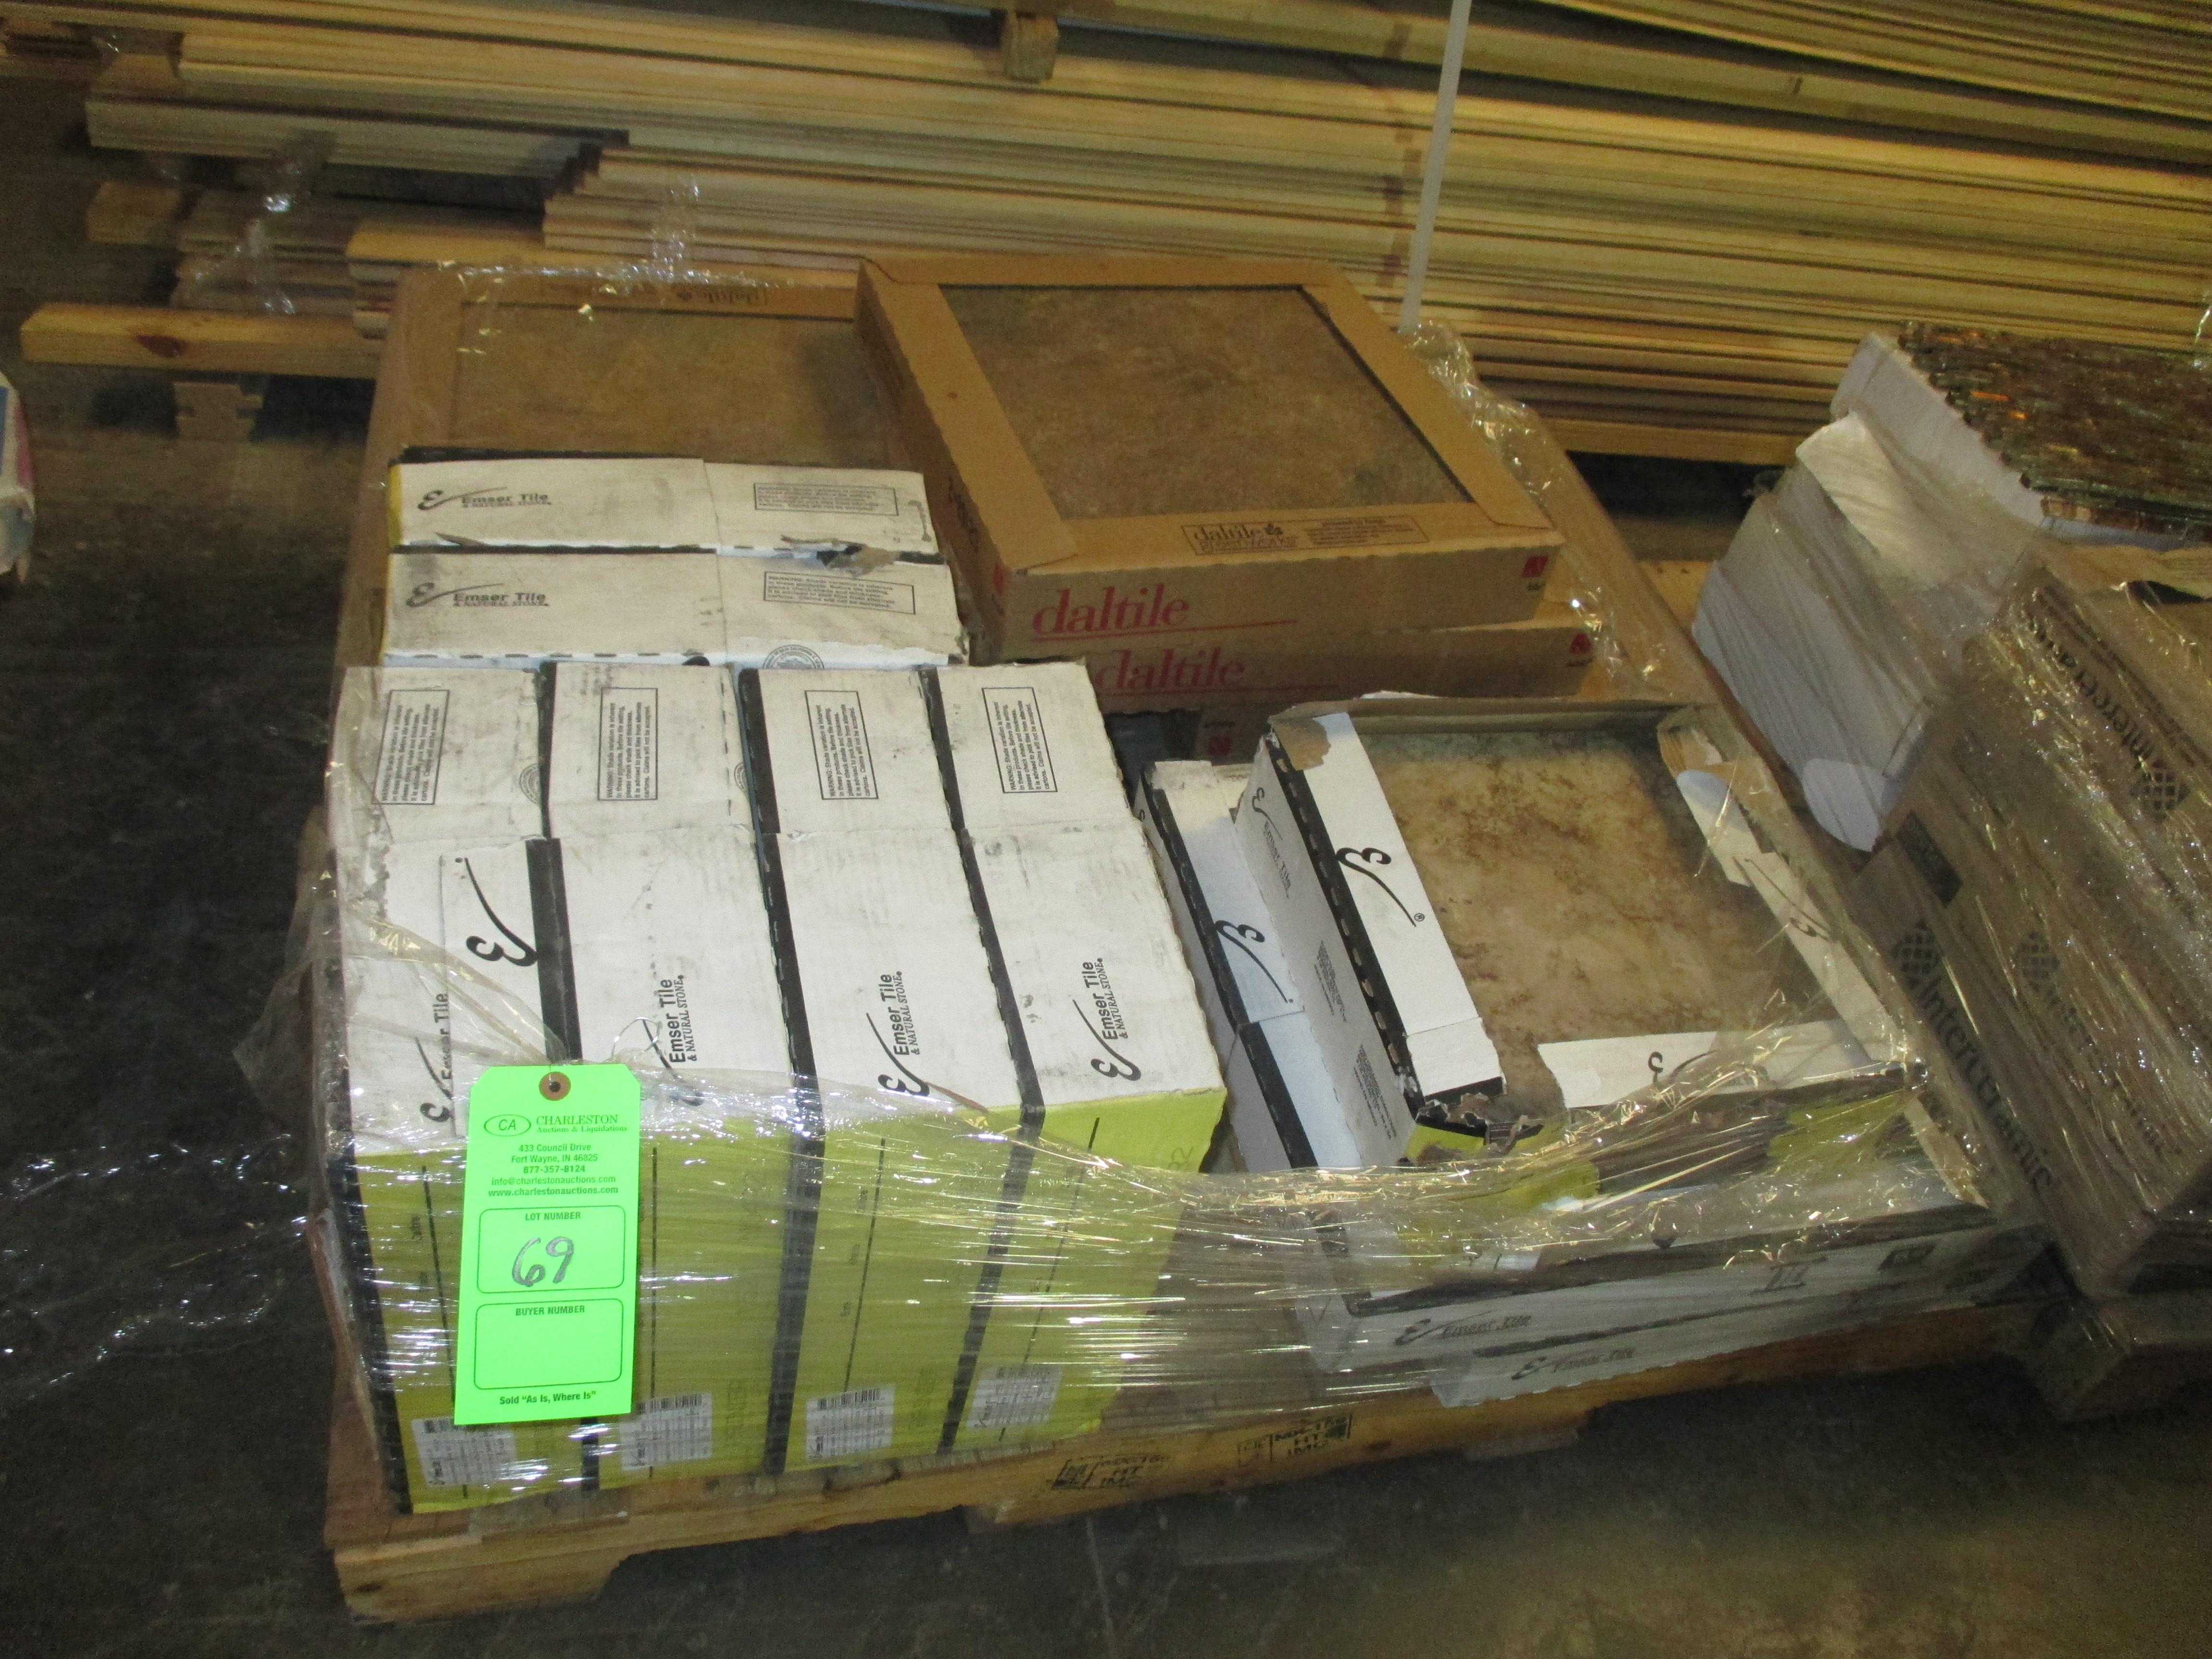 Pallet Of Various Tile Including Daltile 18 X 18 Terrain Marrone 7